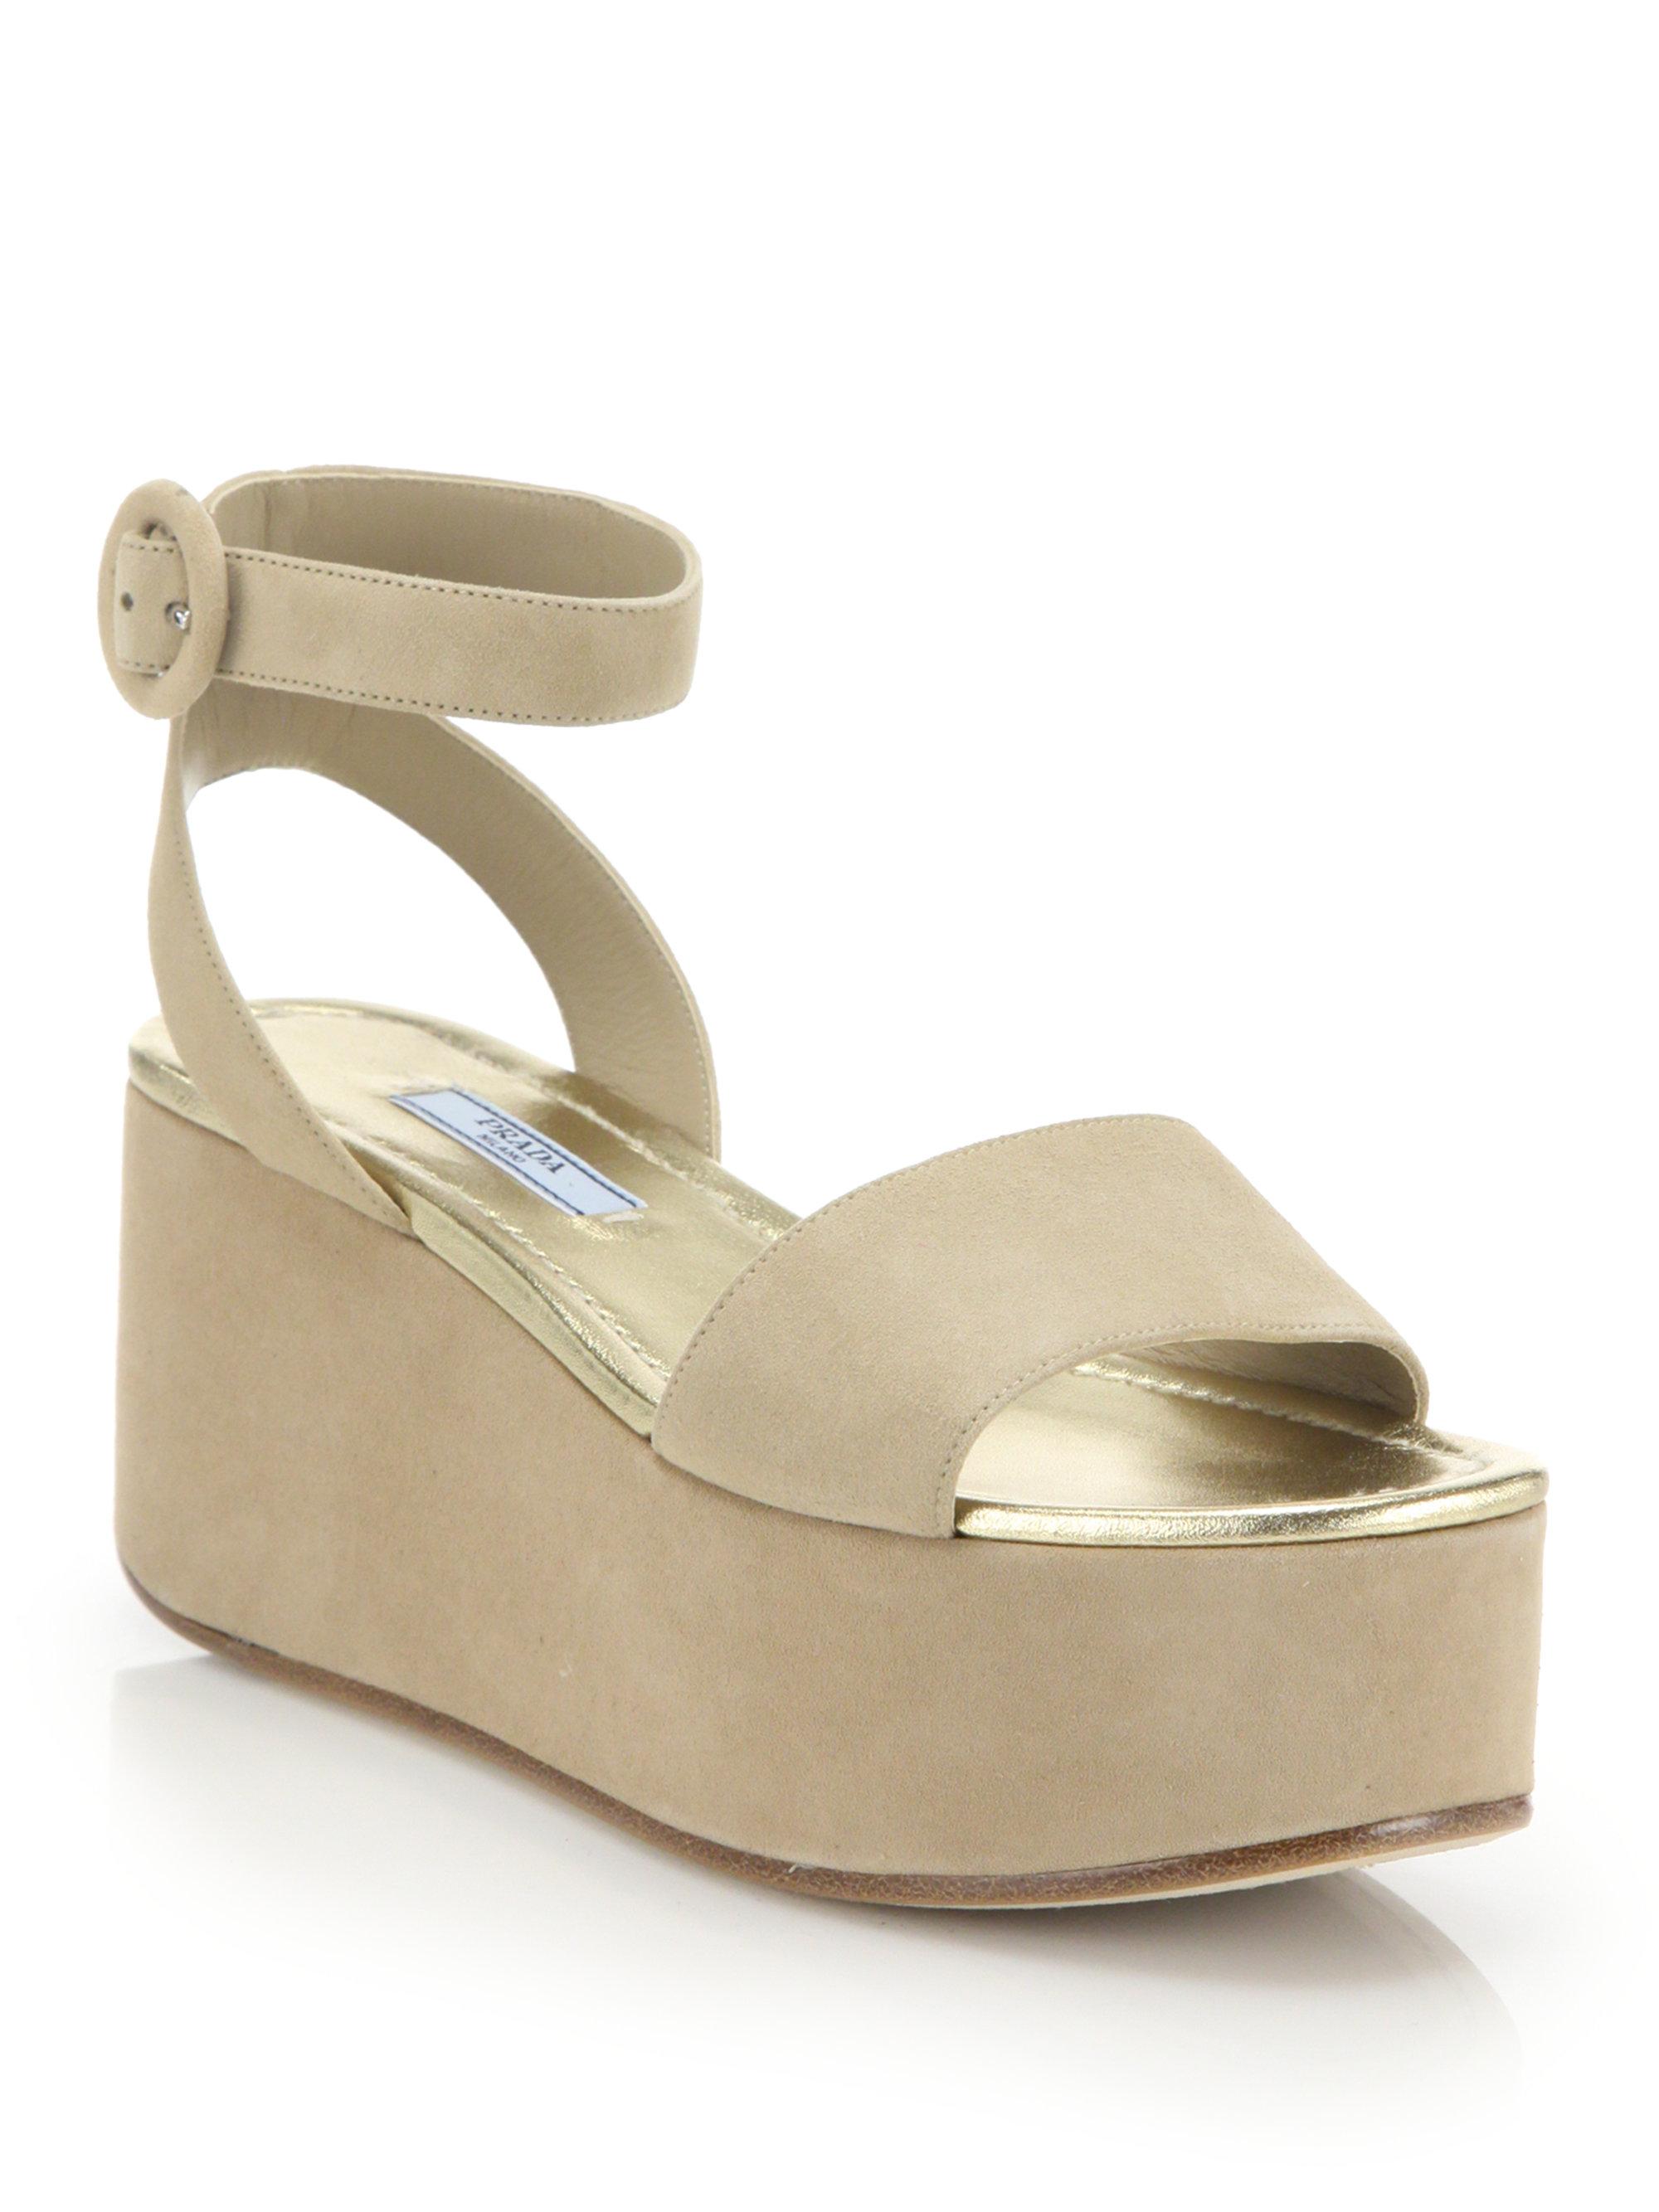 08ff7fb8f564 Lyst - Prada Suede Platform Wedge Sandals in Natural